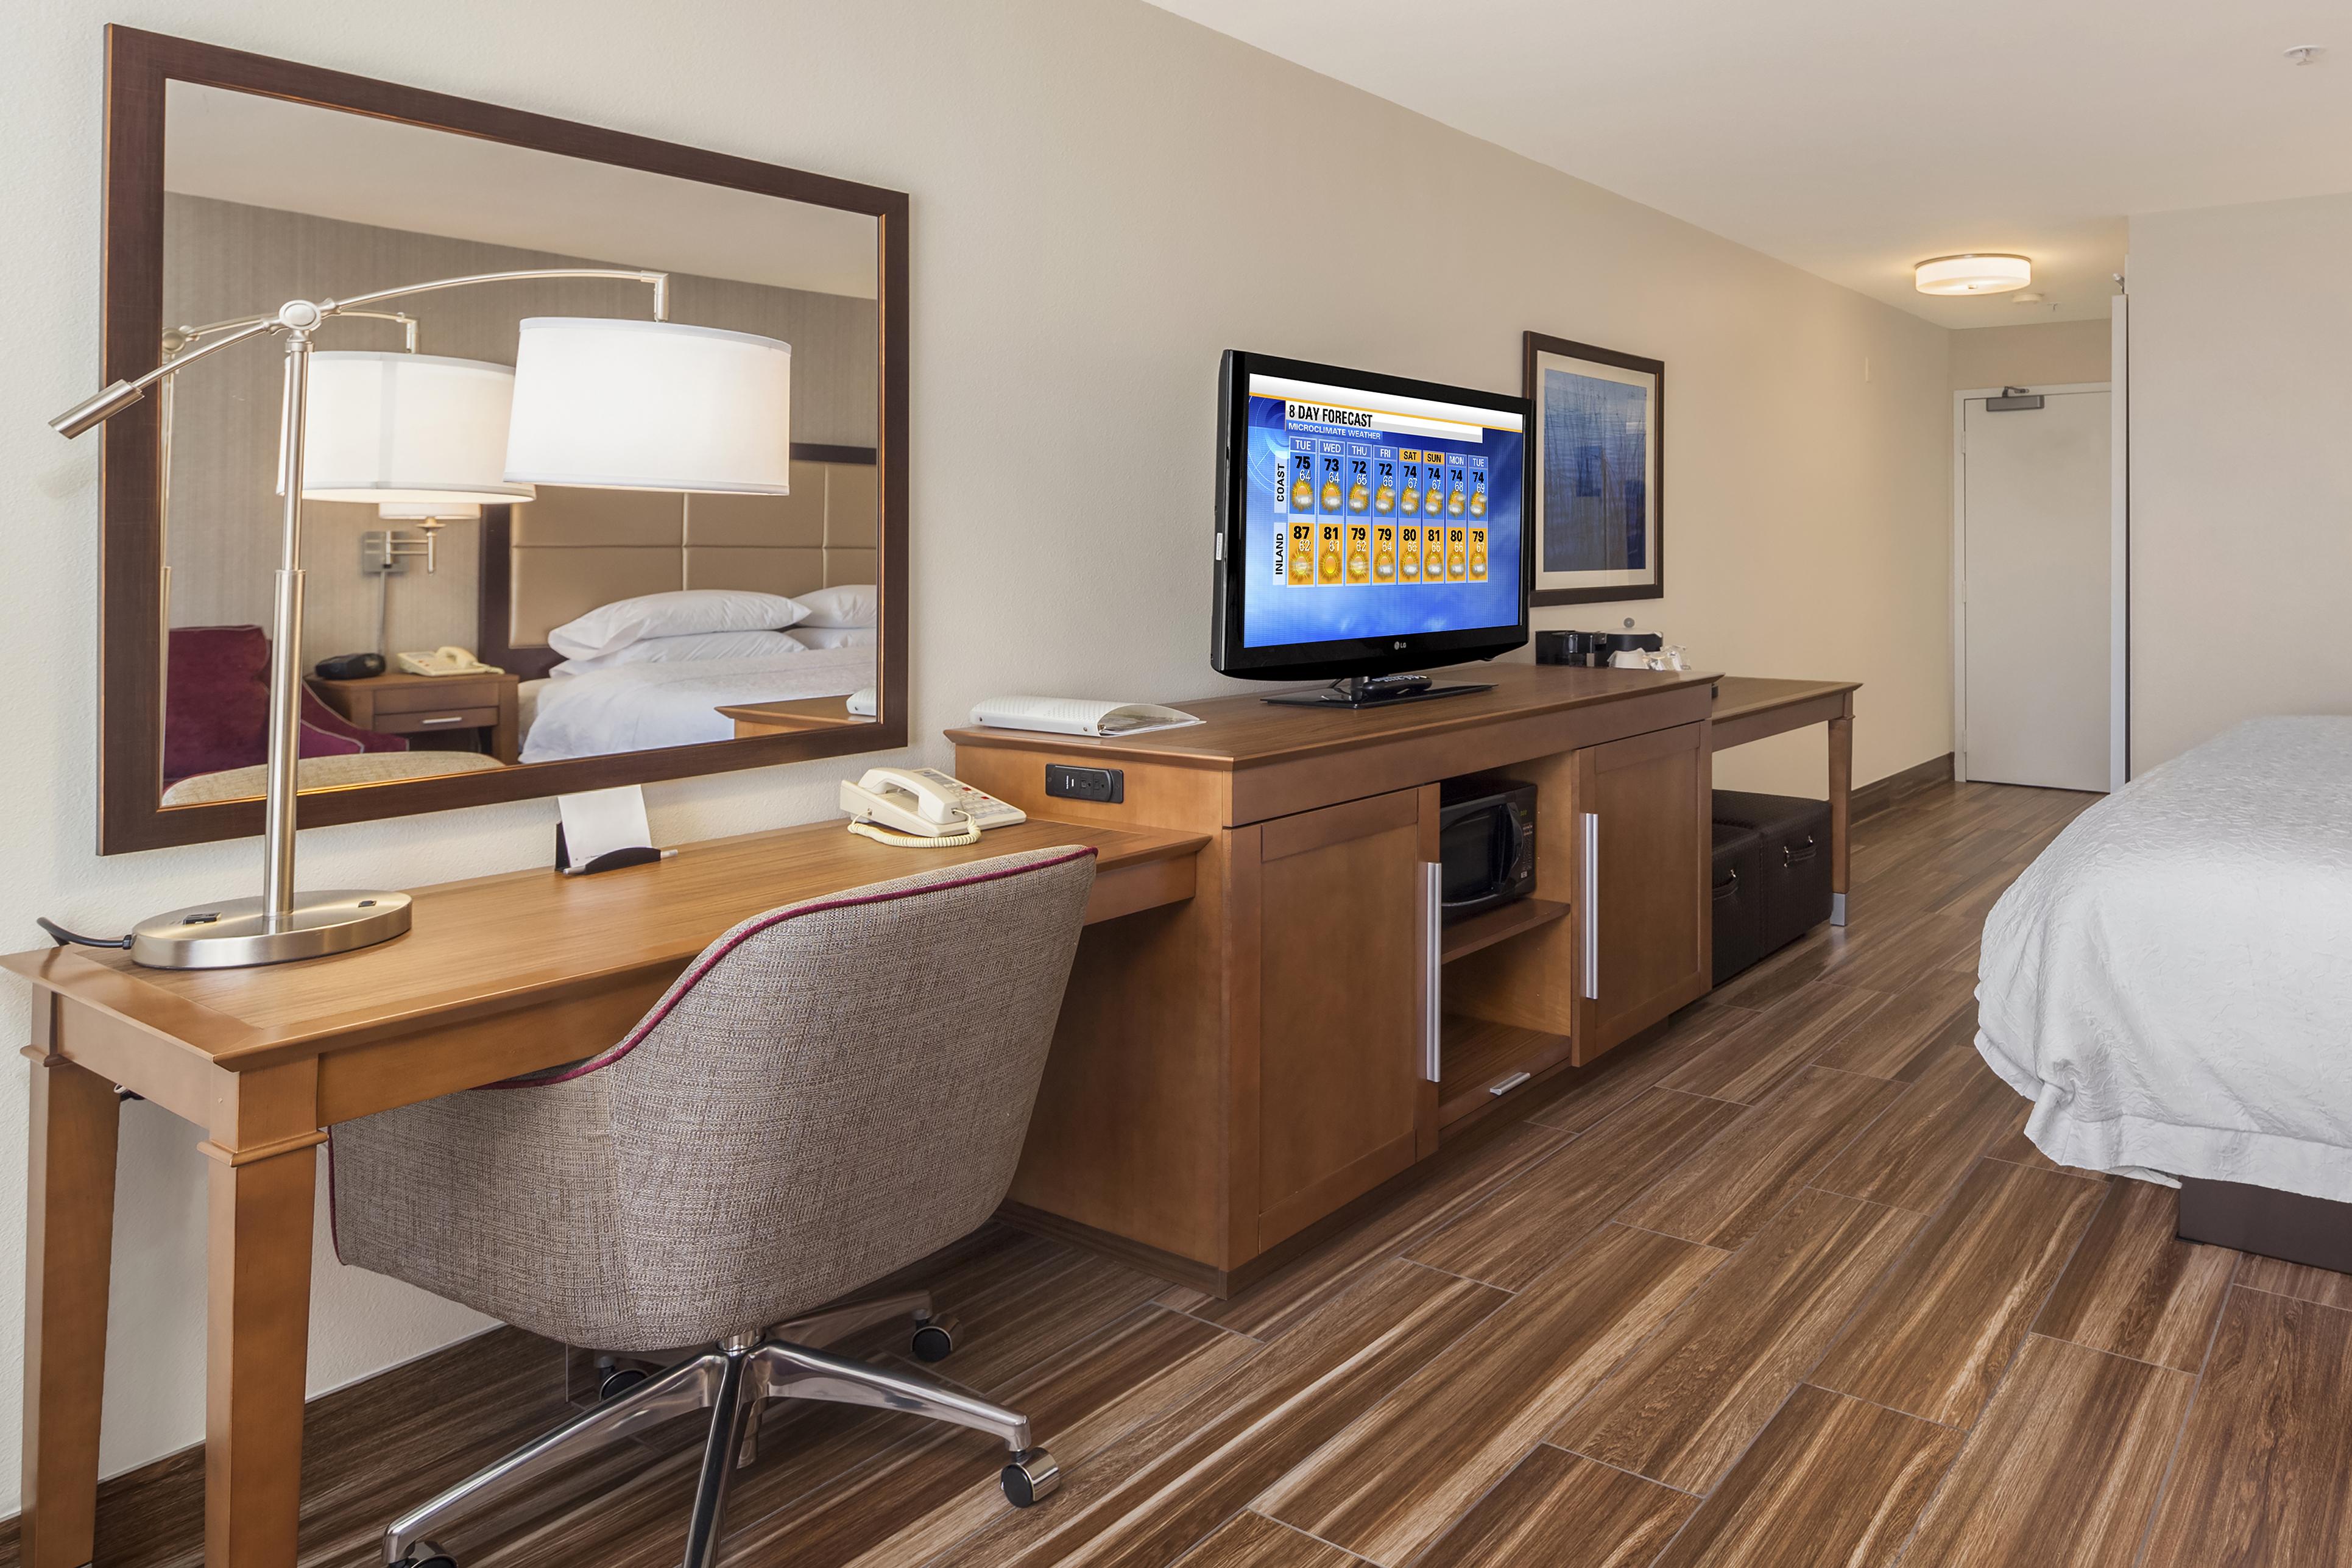 https://www.hotelsbyday.com/_data/default-hotel_image/4/21717/nkr-nkx-nkjy-3.jpg